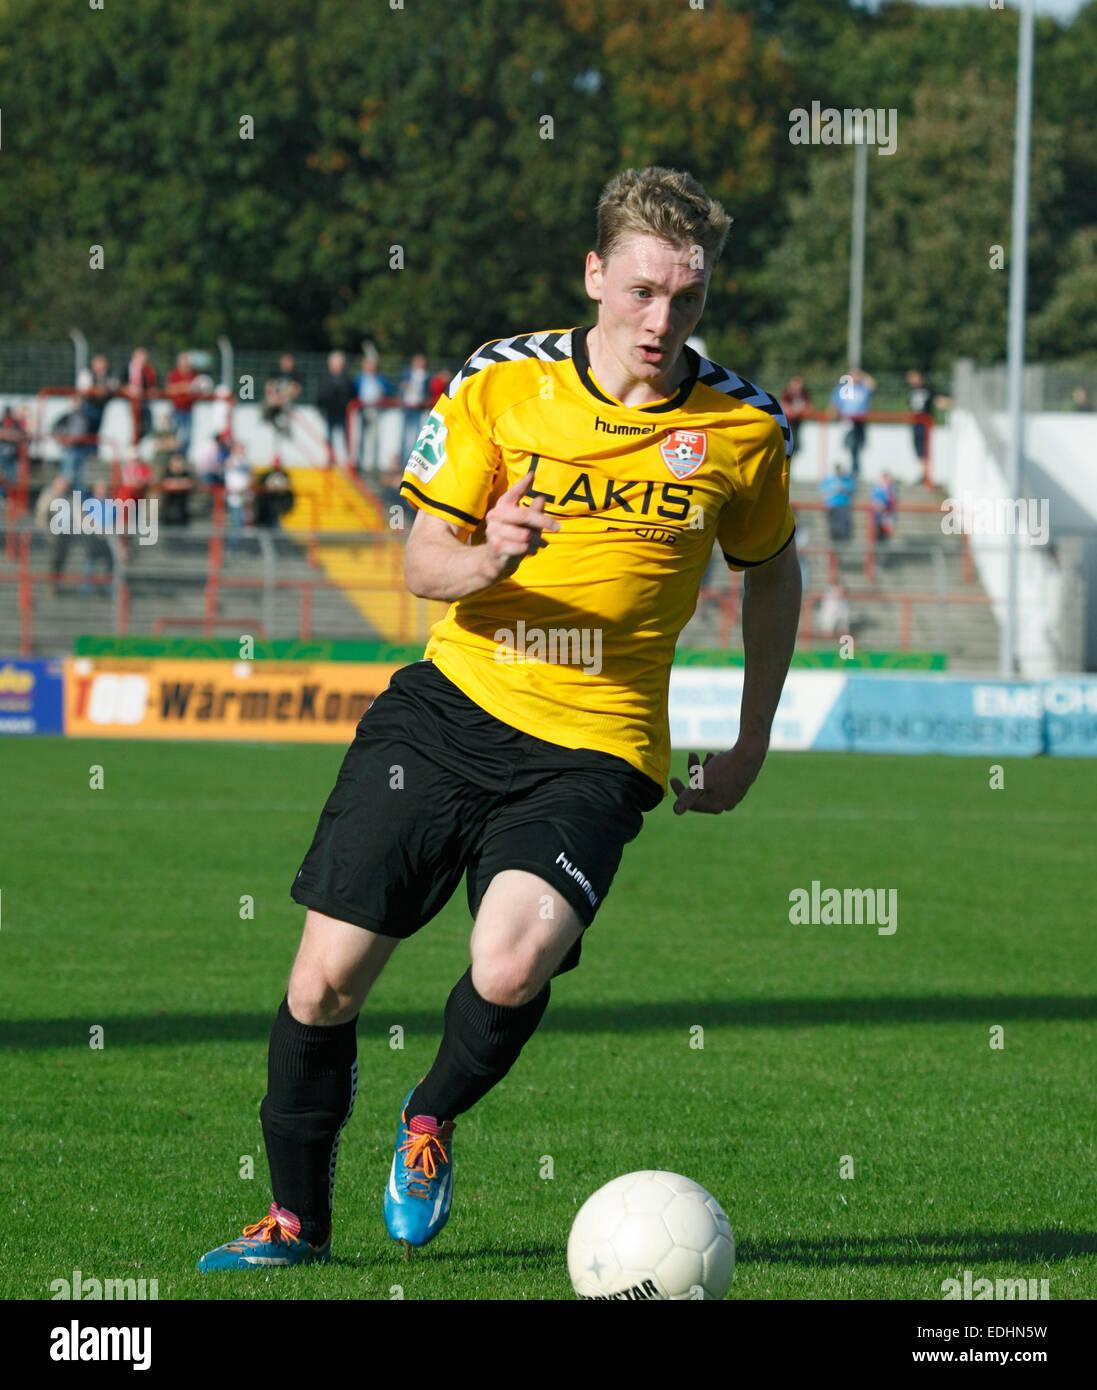 Spielszene, Sebastian Hirsch (KFC) am Ball, Stadion Niederrhein Oberhausen, Regionalliga West, 2014/2015, RW Oberhausen Stock Photo